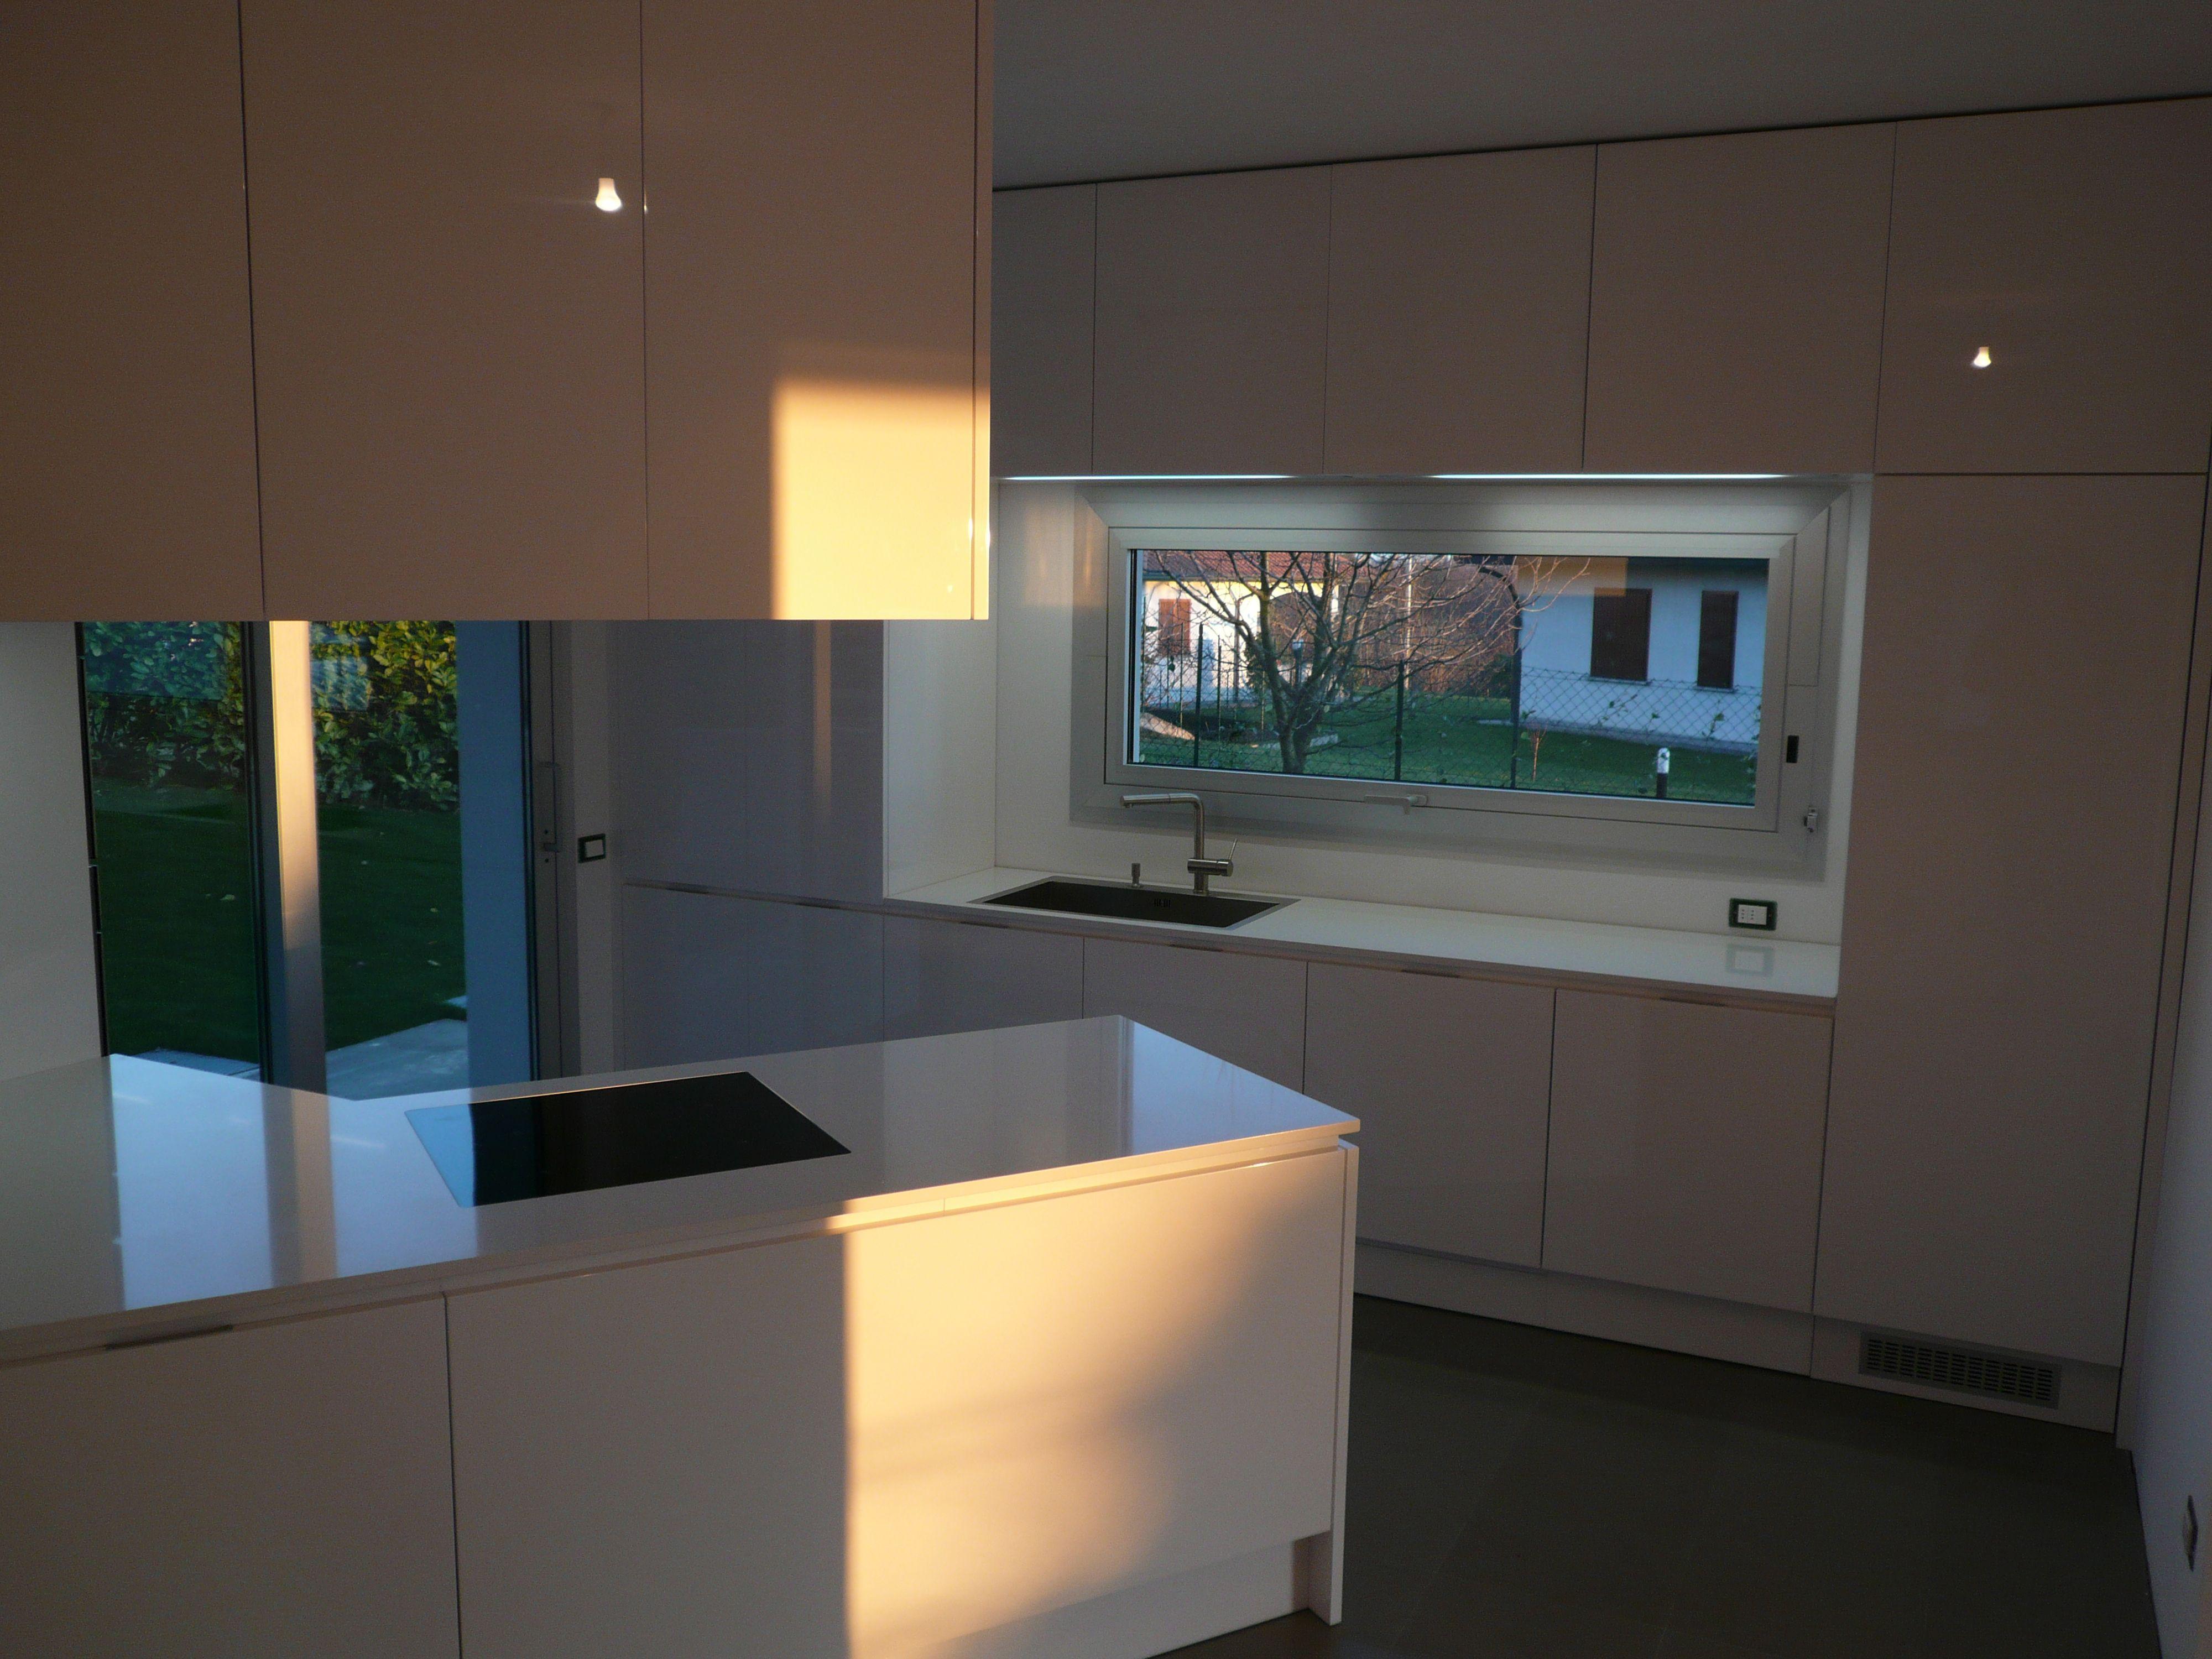 cucina su misura, cucina artigianale, cucina bianca lucida, cucina ...